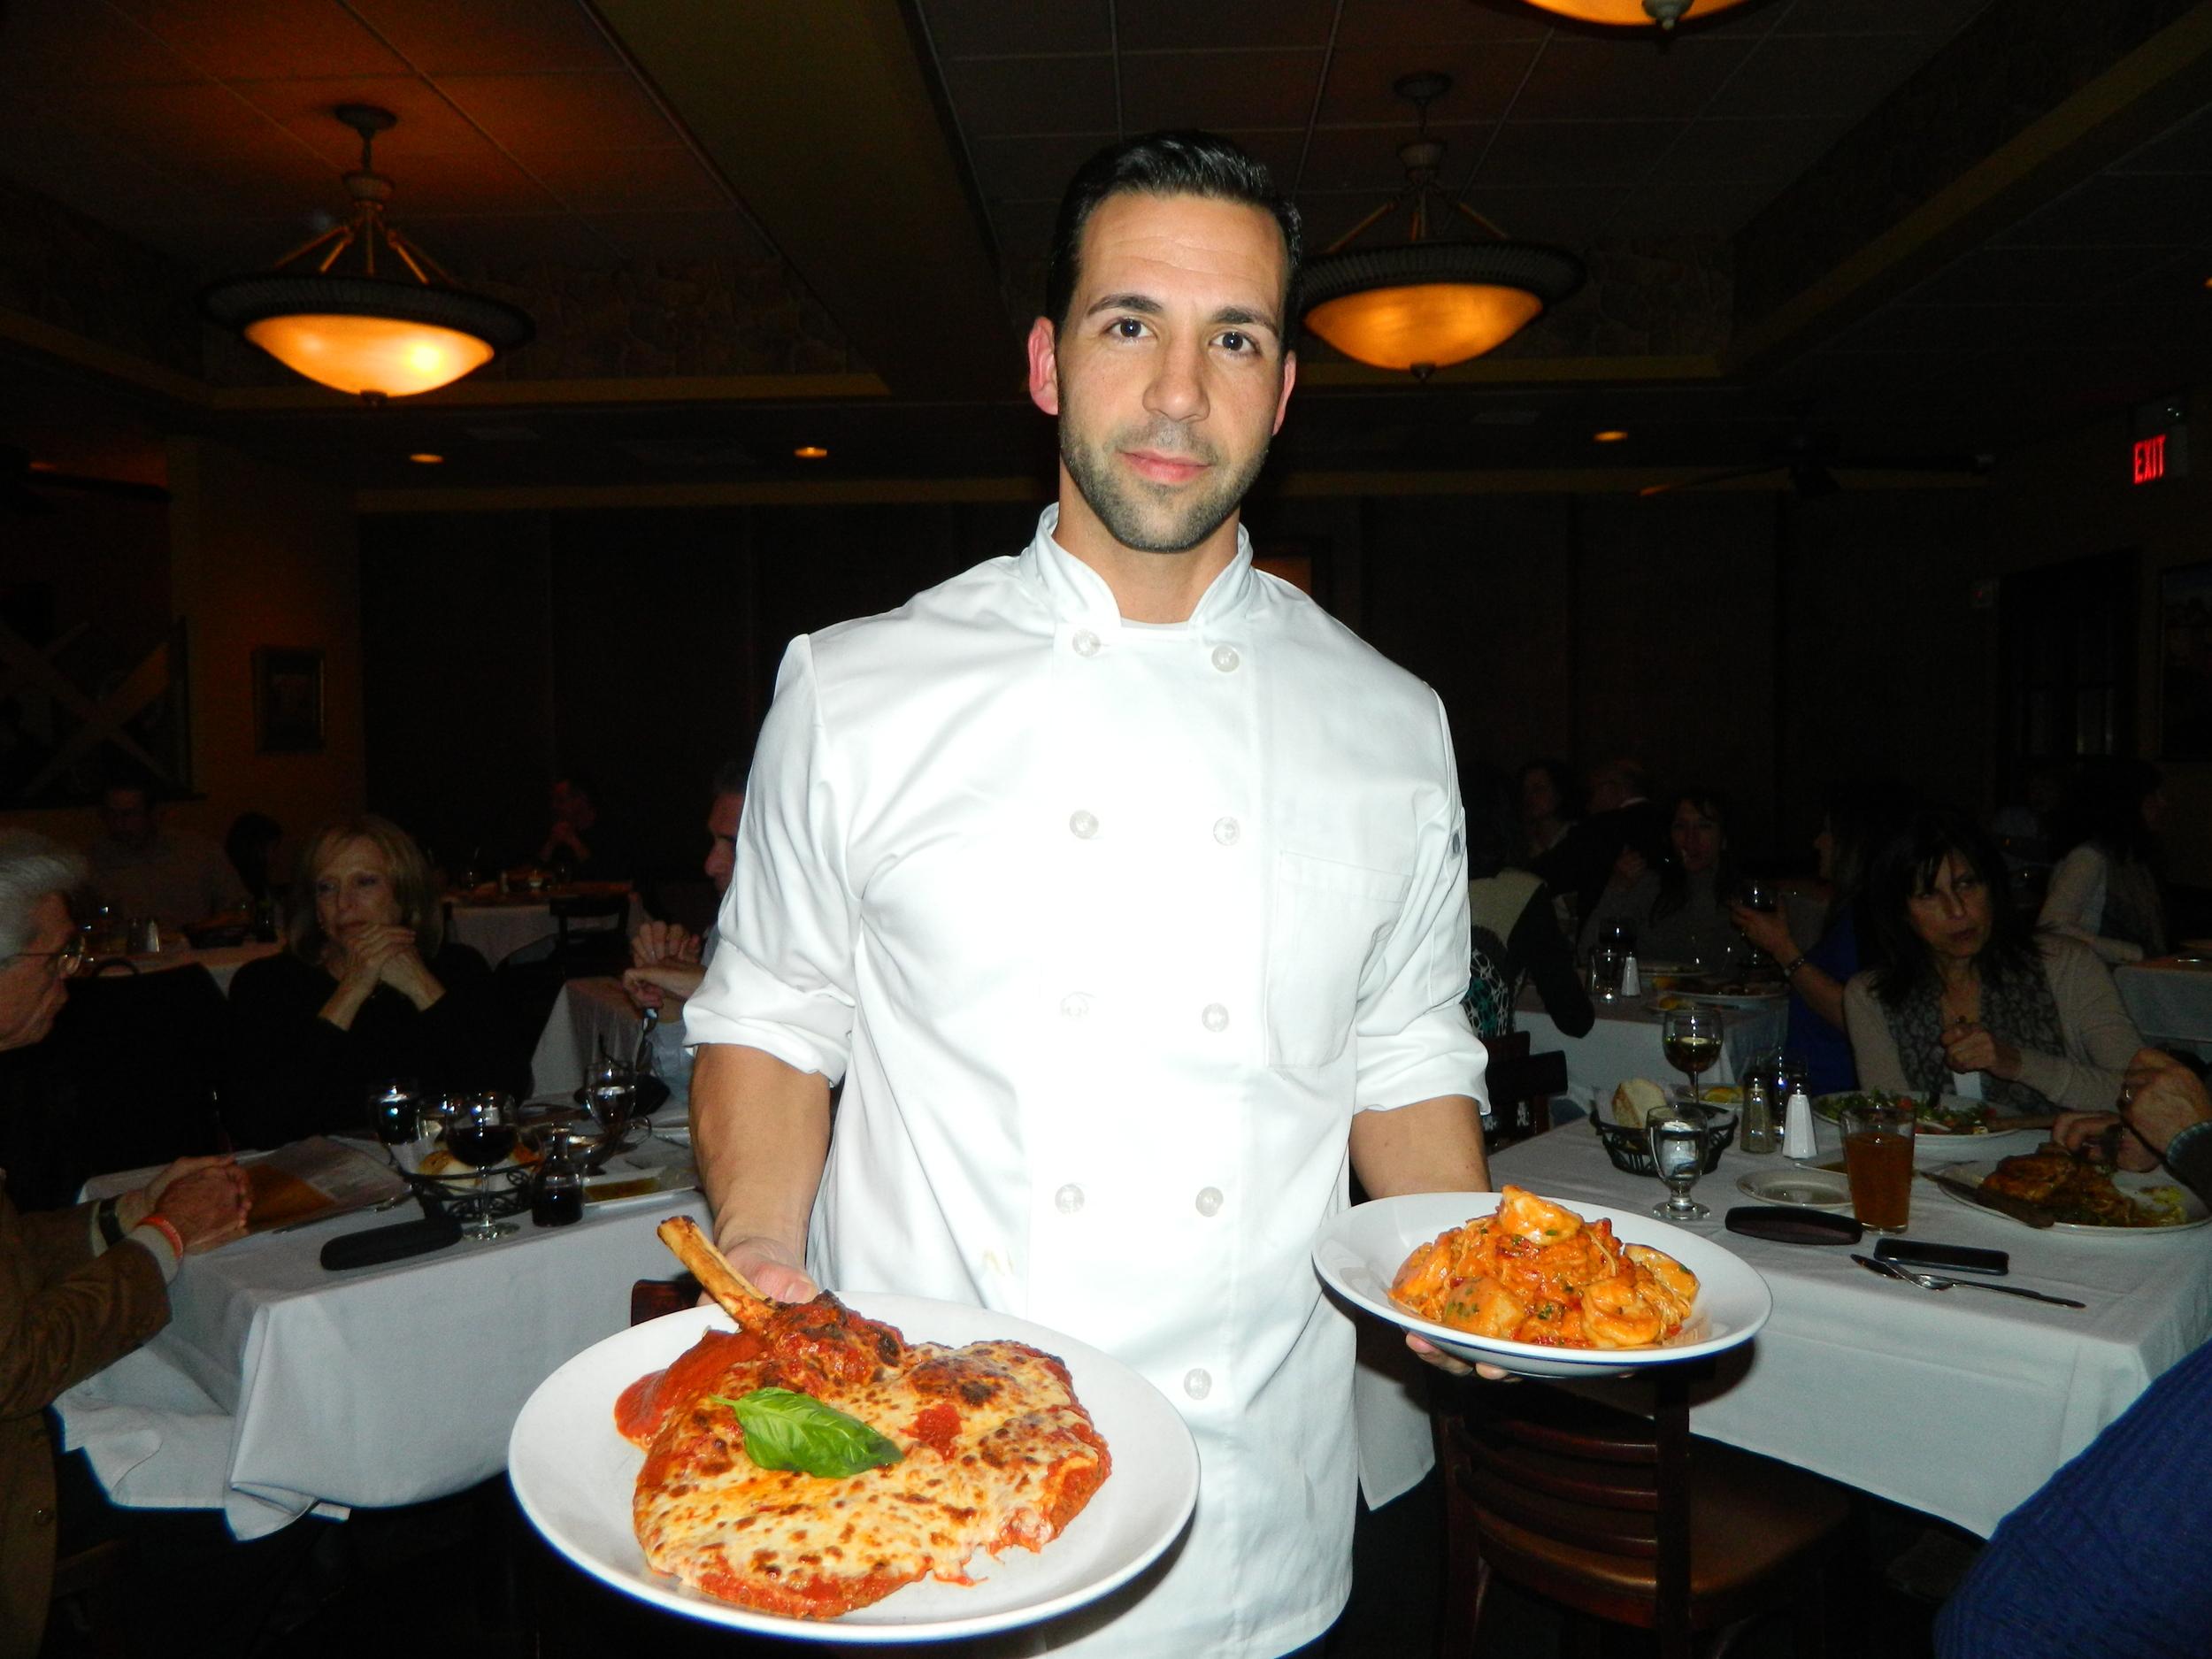 Cirella's Executive Chef Anthony Trobiano presents eggplant parmigiana and Capellini Pescatore entrees.